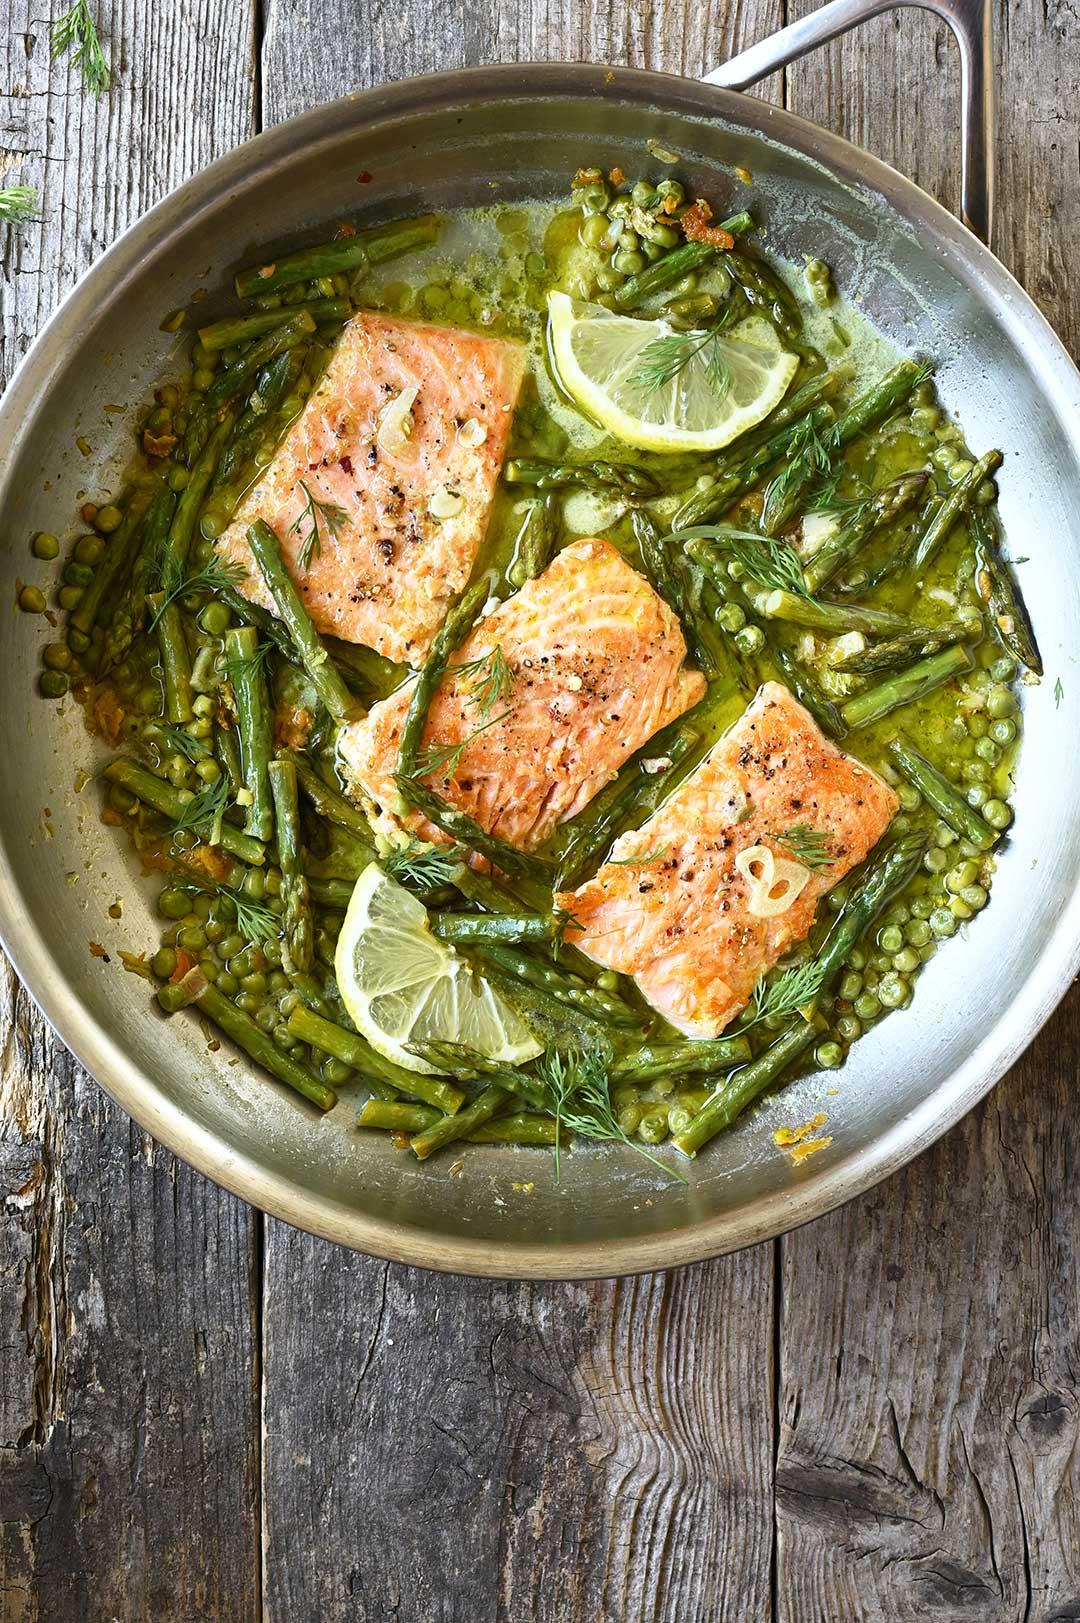 serving dumplings | One skillet salmon with asparagus in lemon garlic sauce